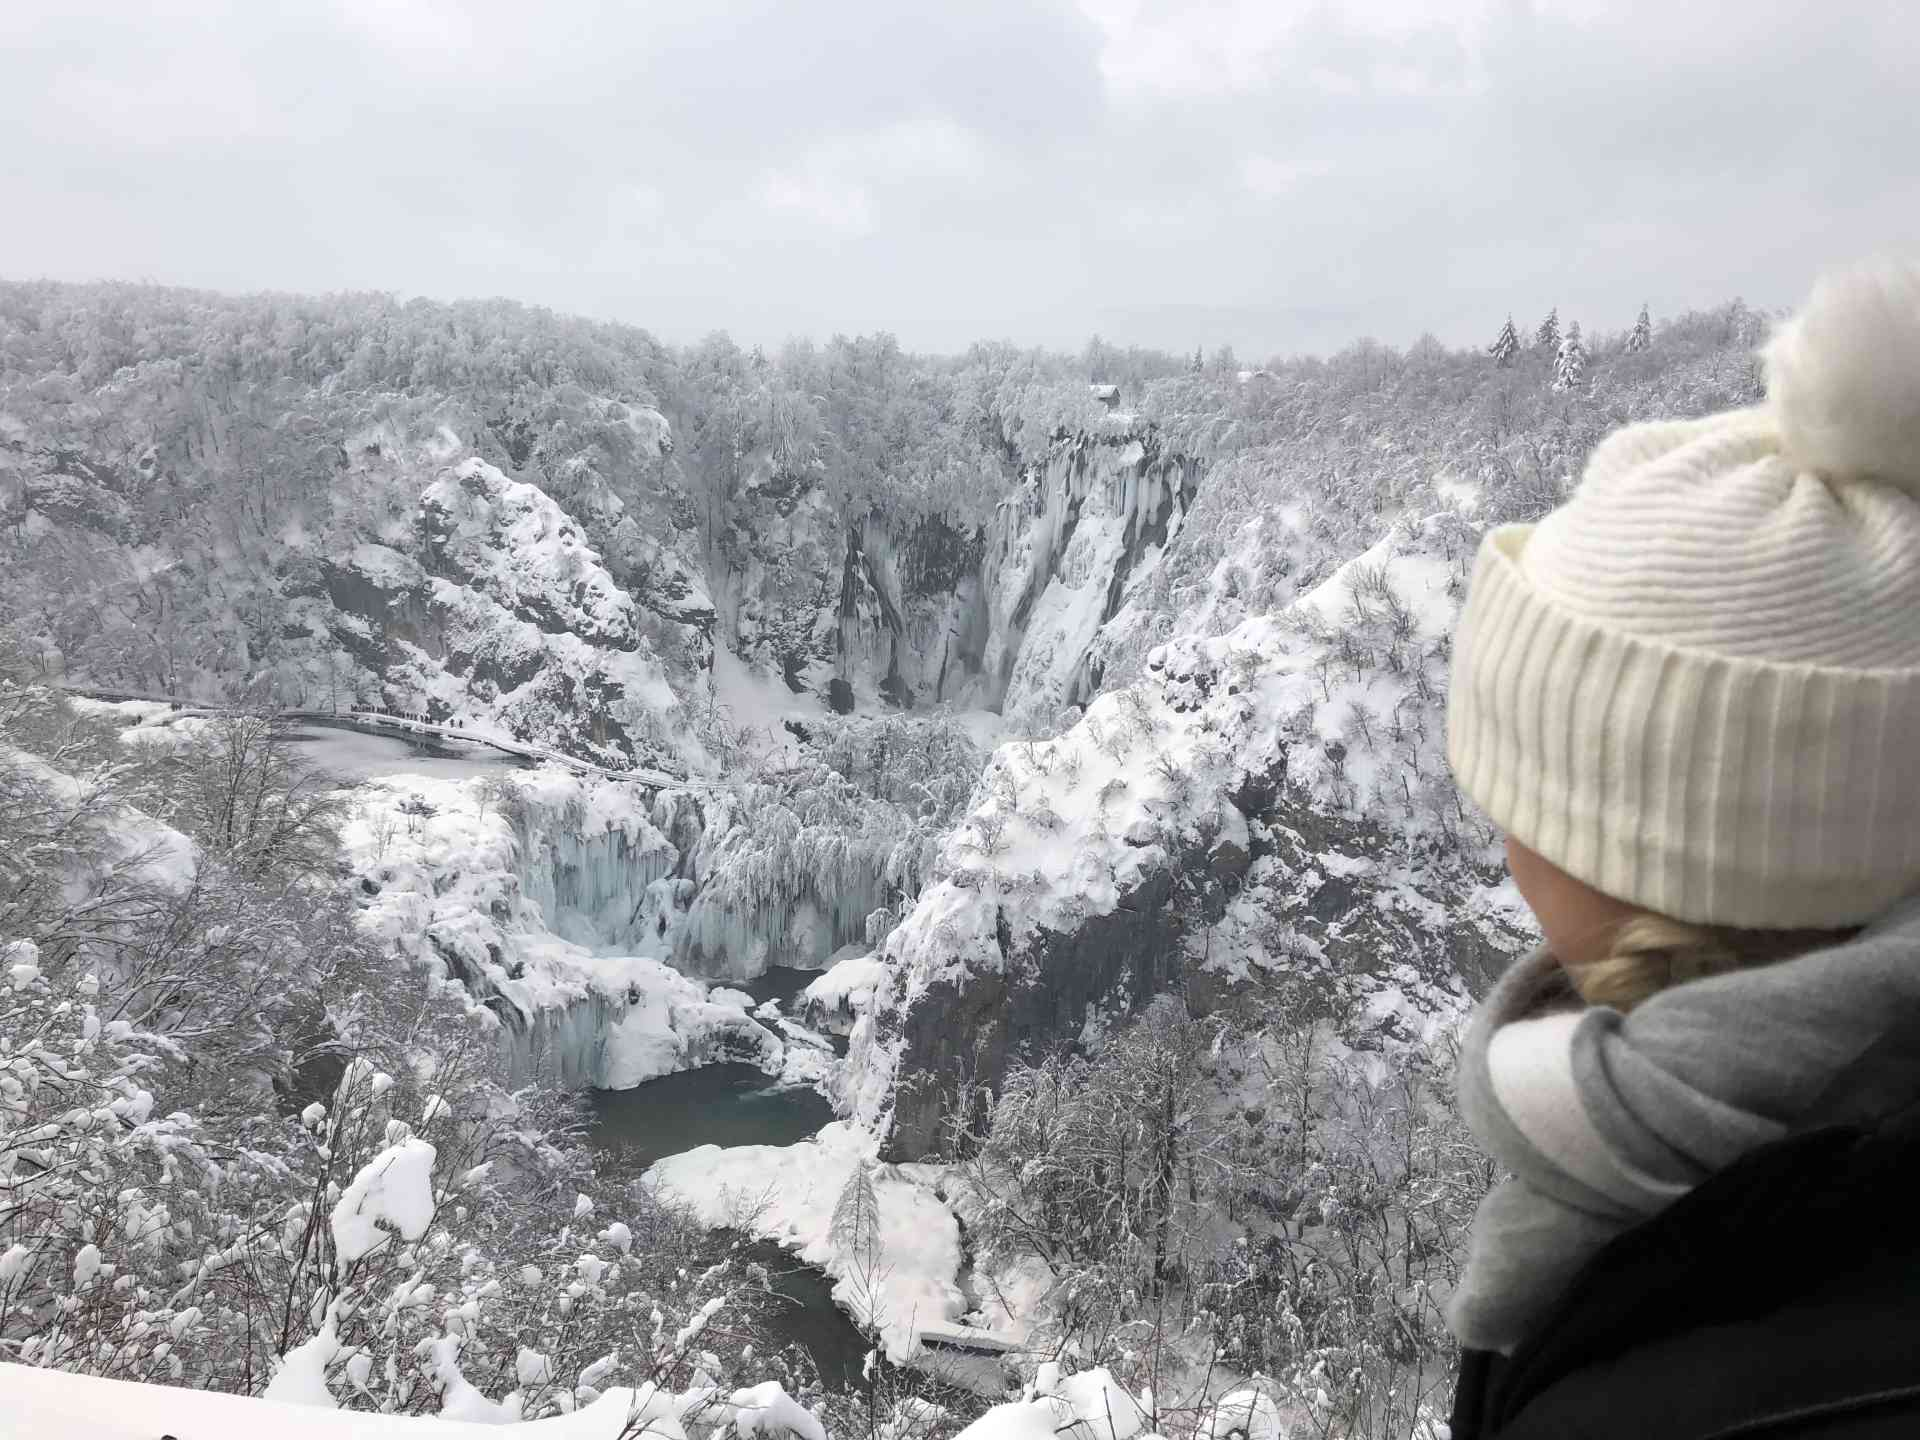 Winter wonderland in Plitvice